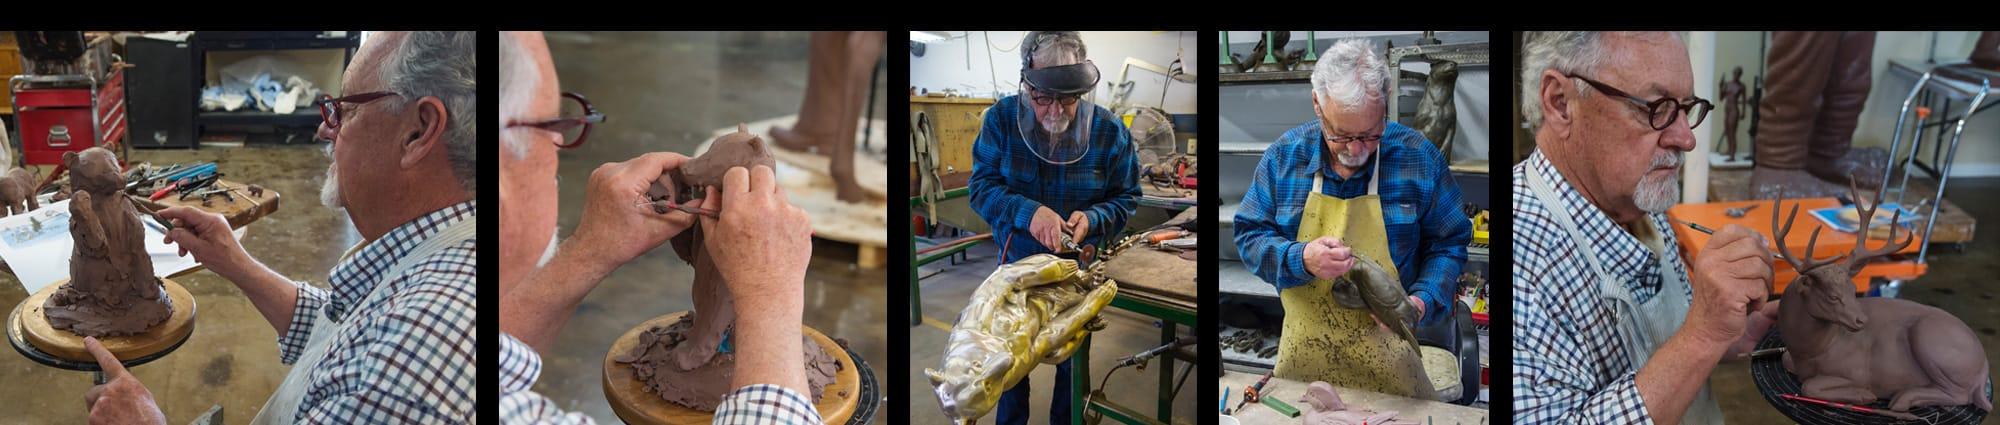 Pictures of Thomas D. Mangelsen sculpting